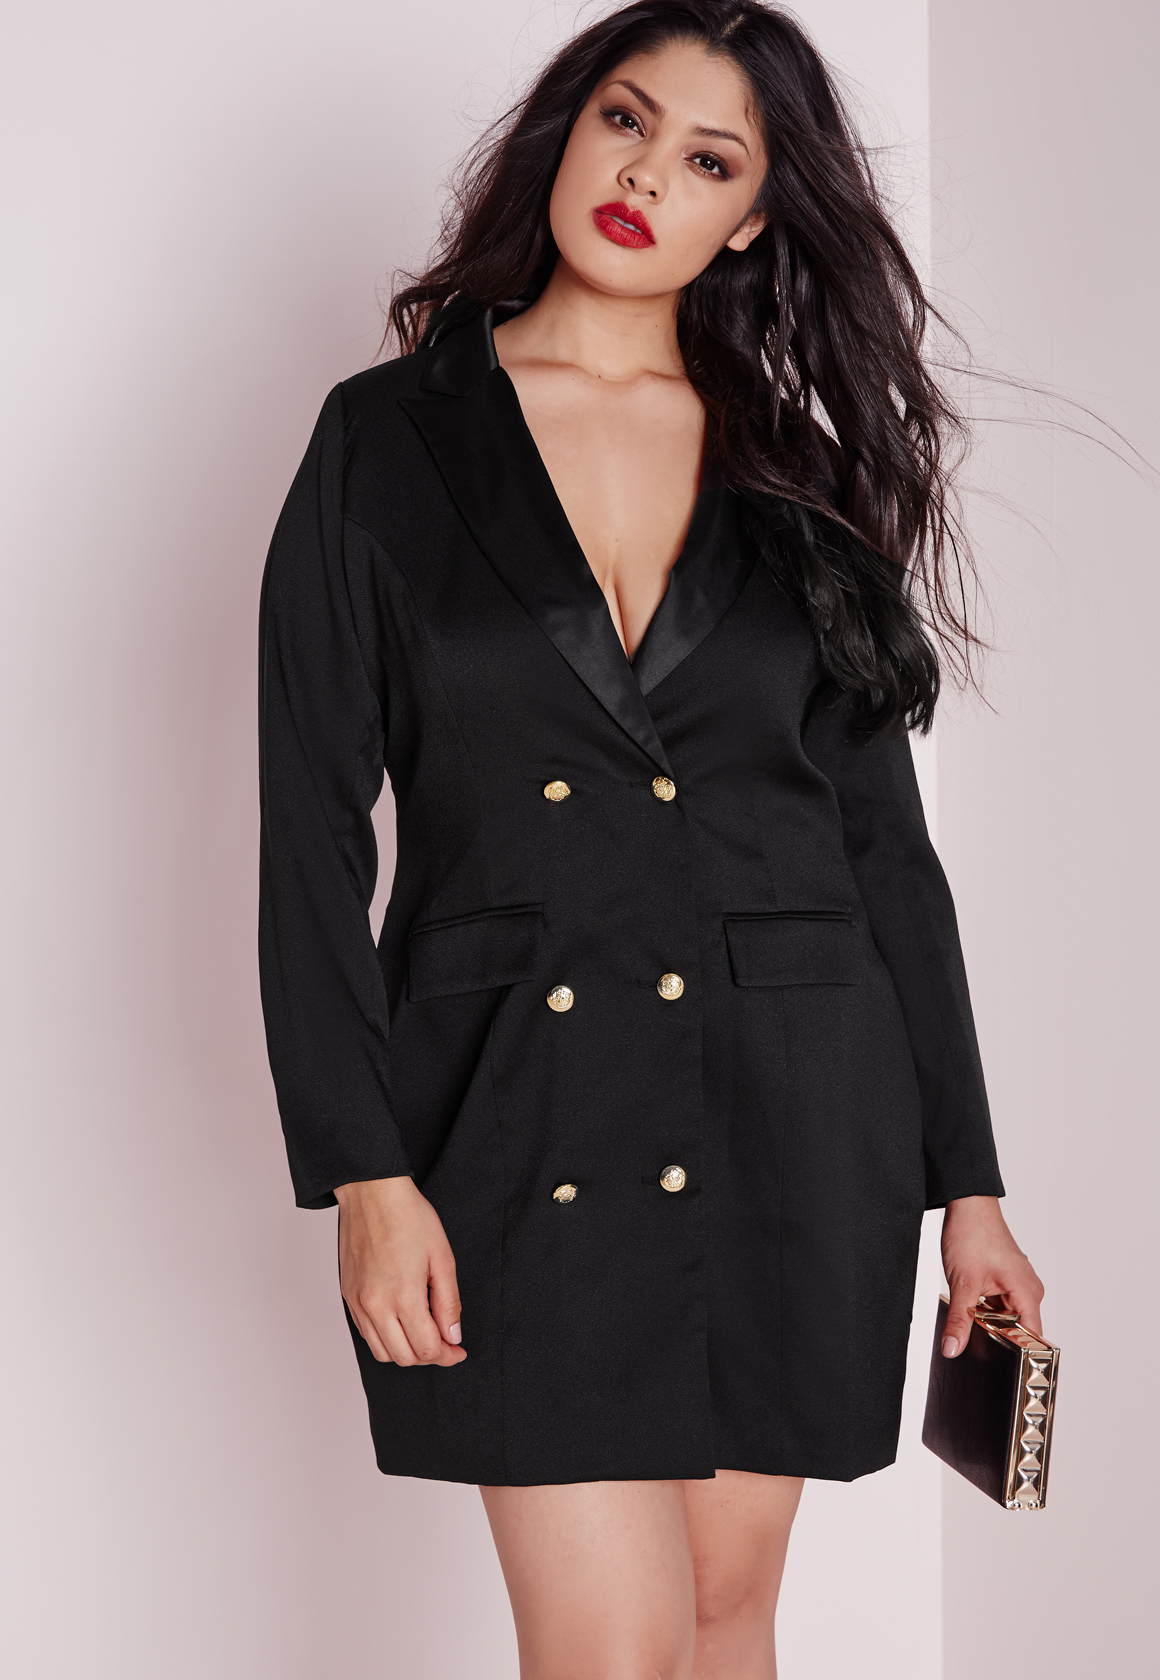 Missguided Plus Size Tuxedo Satin Collar Dress Black in Black - Lyst